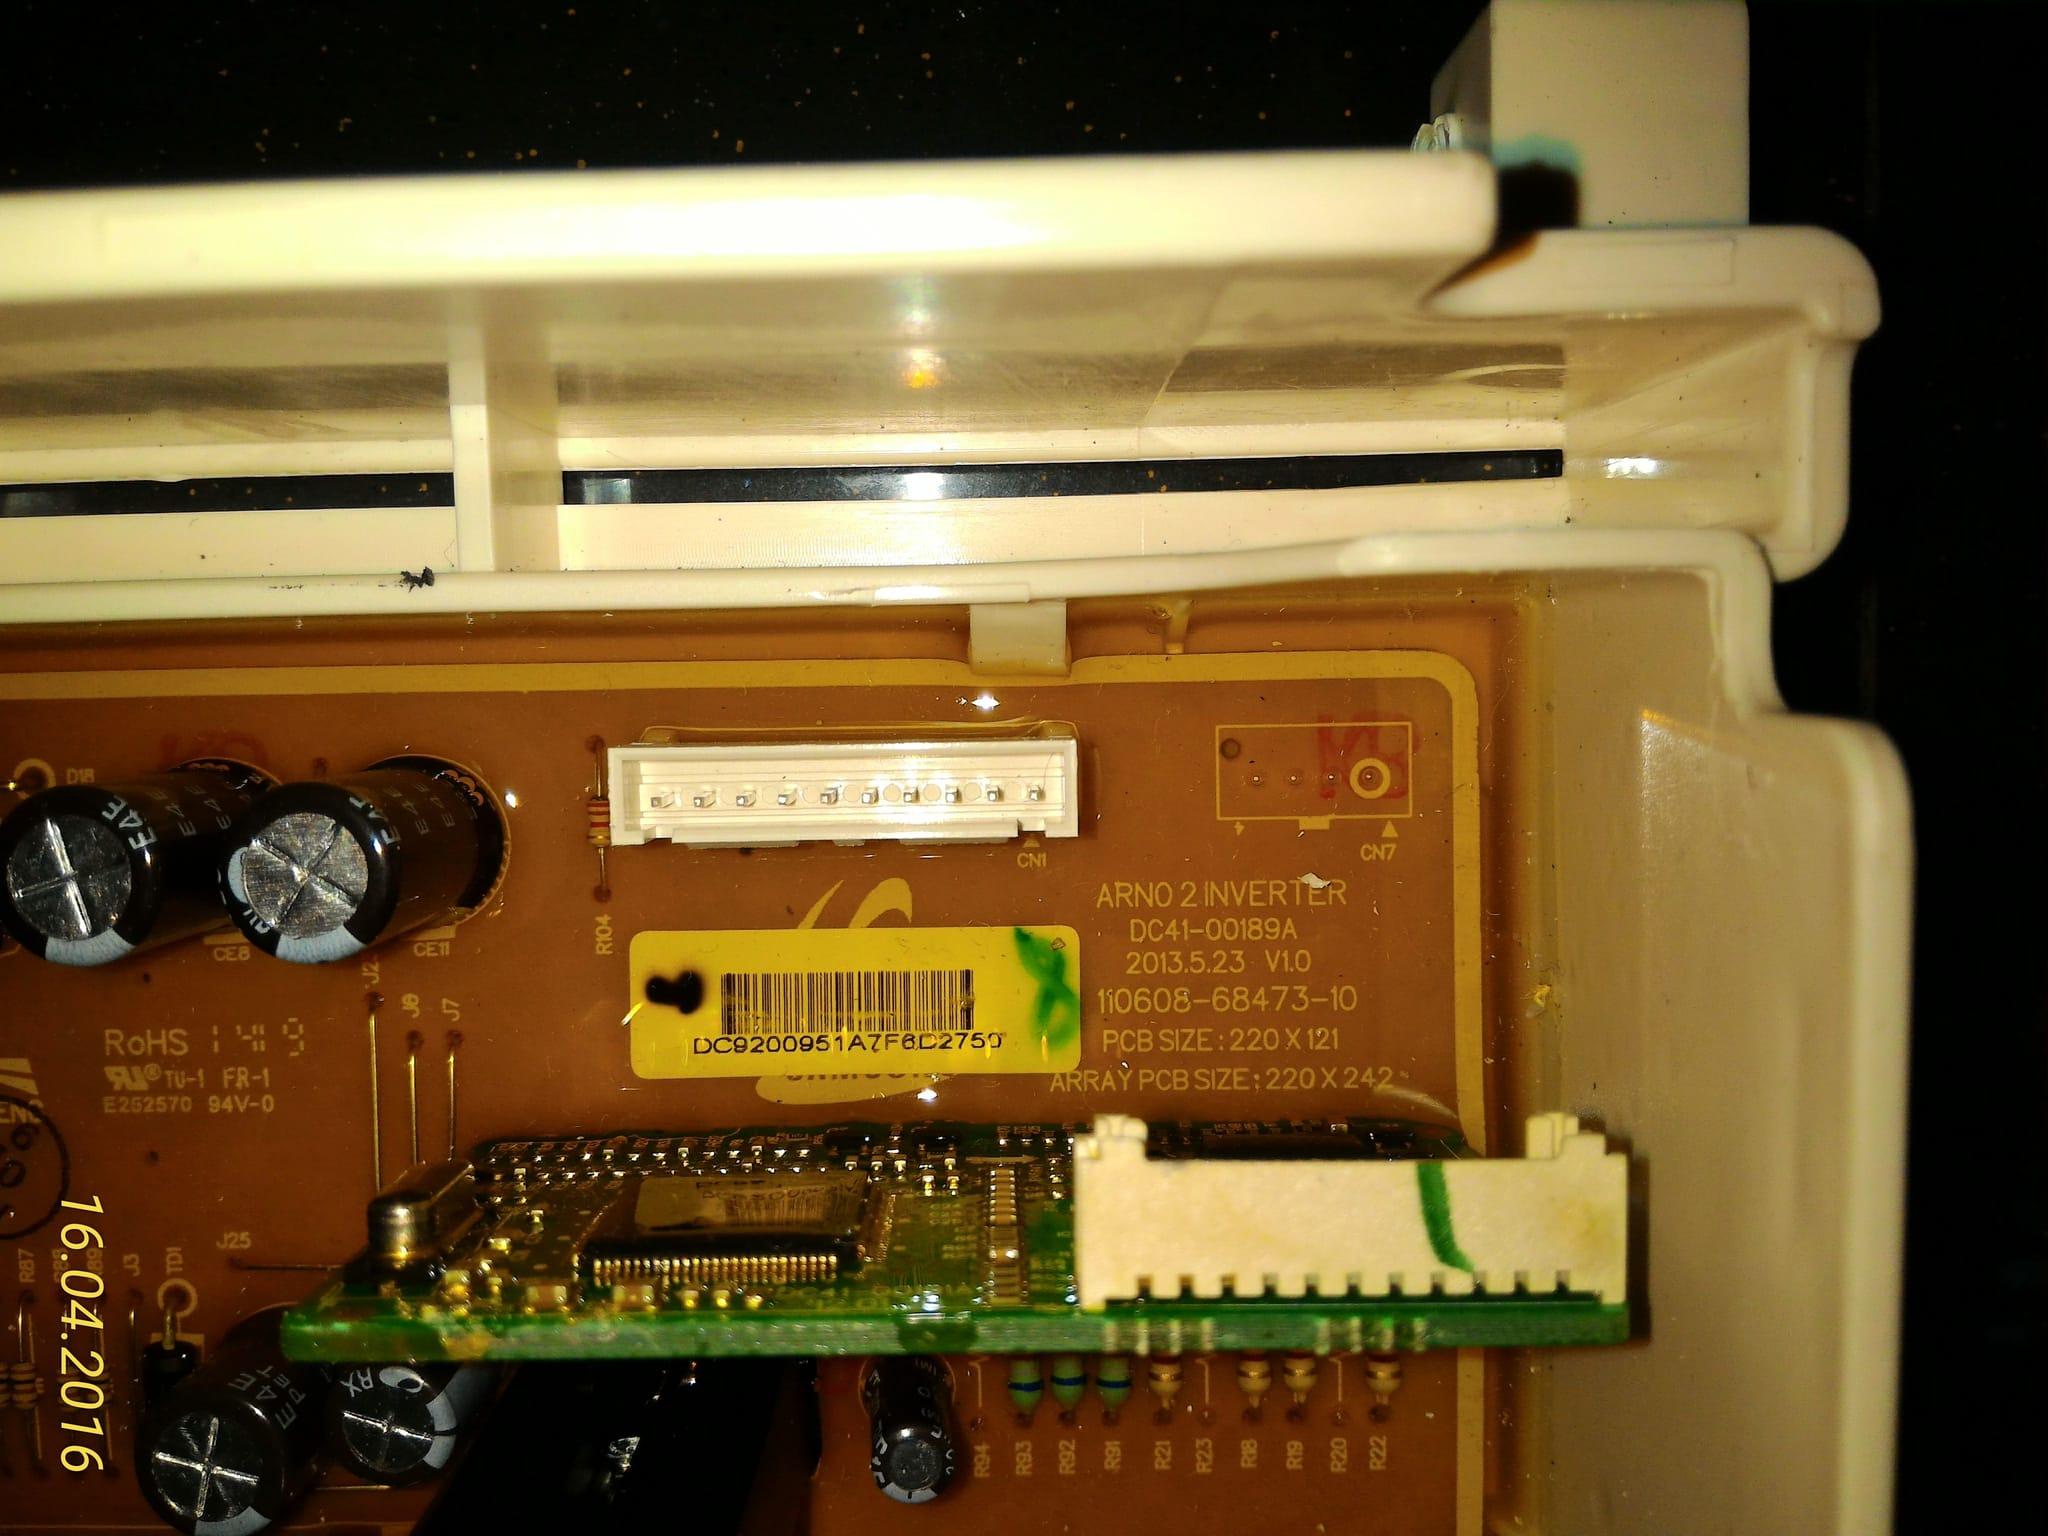 Jual Arno 2 Digital Inverter Board Dc41 00189a Samsung Di